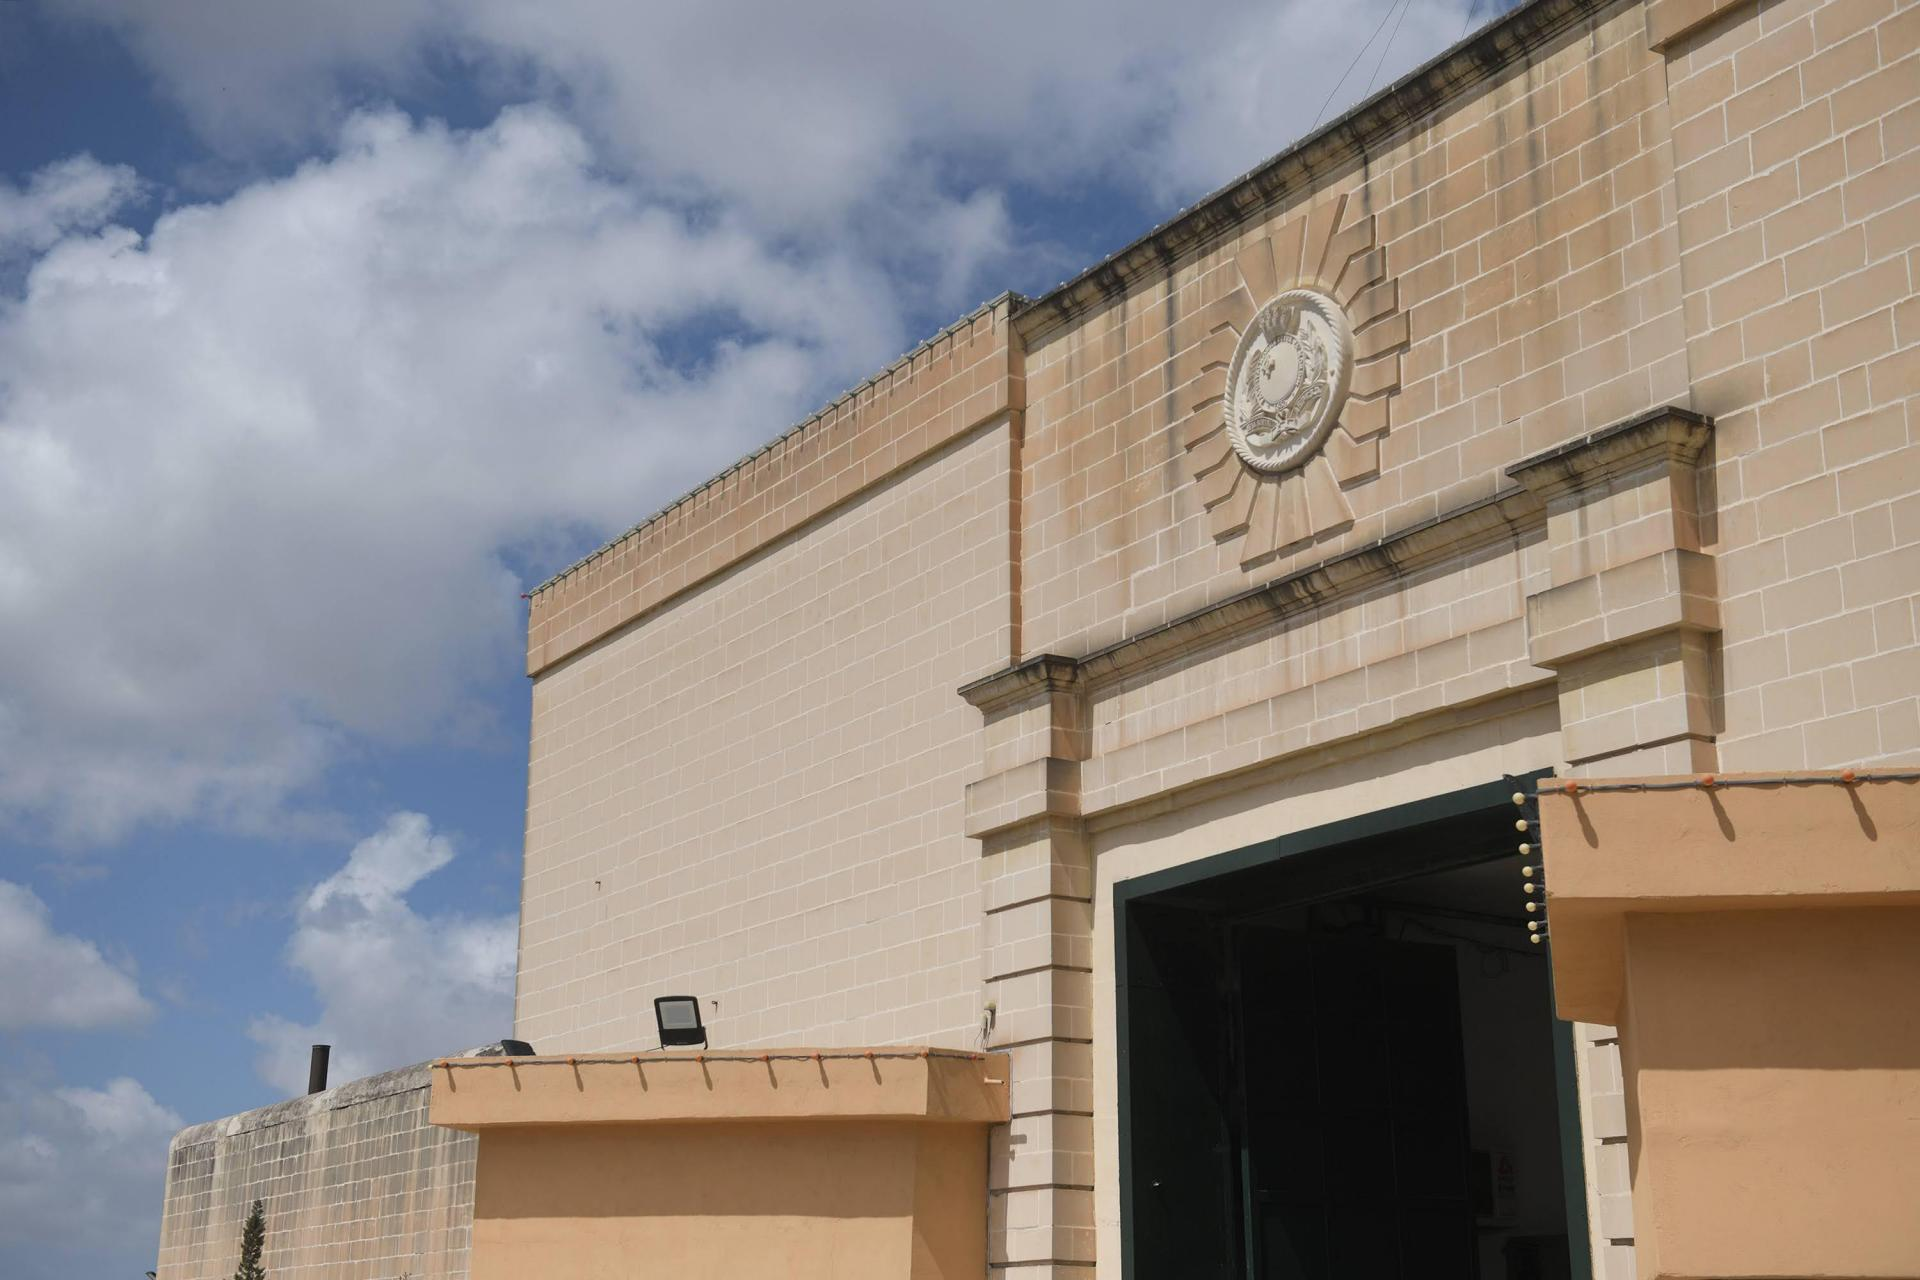 The entrance to Corradino Correctional Facility. Photo: Matthew Mirabelli